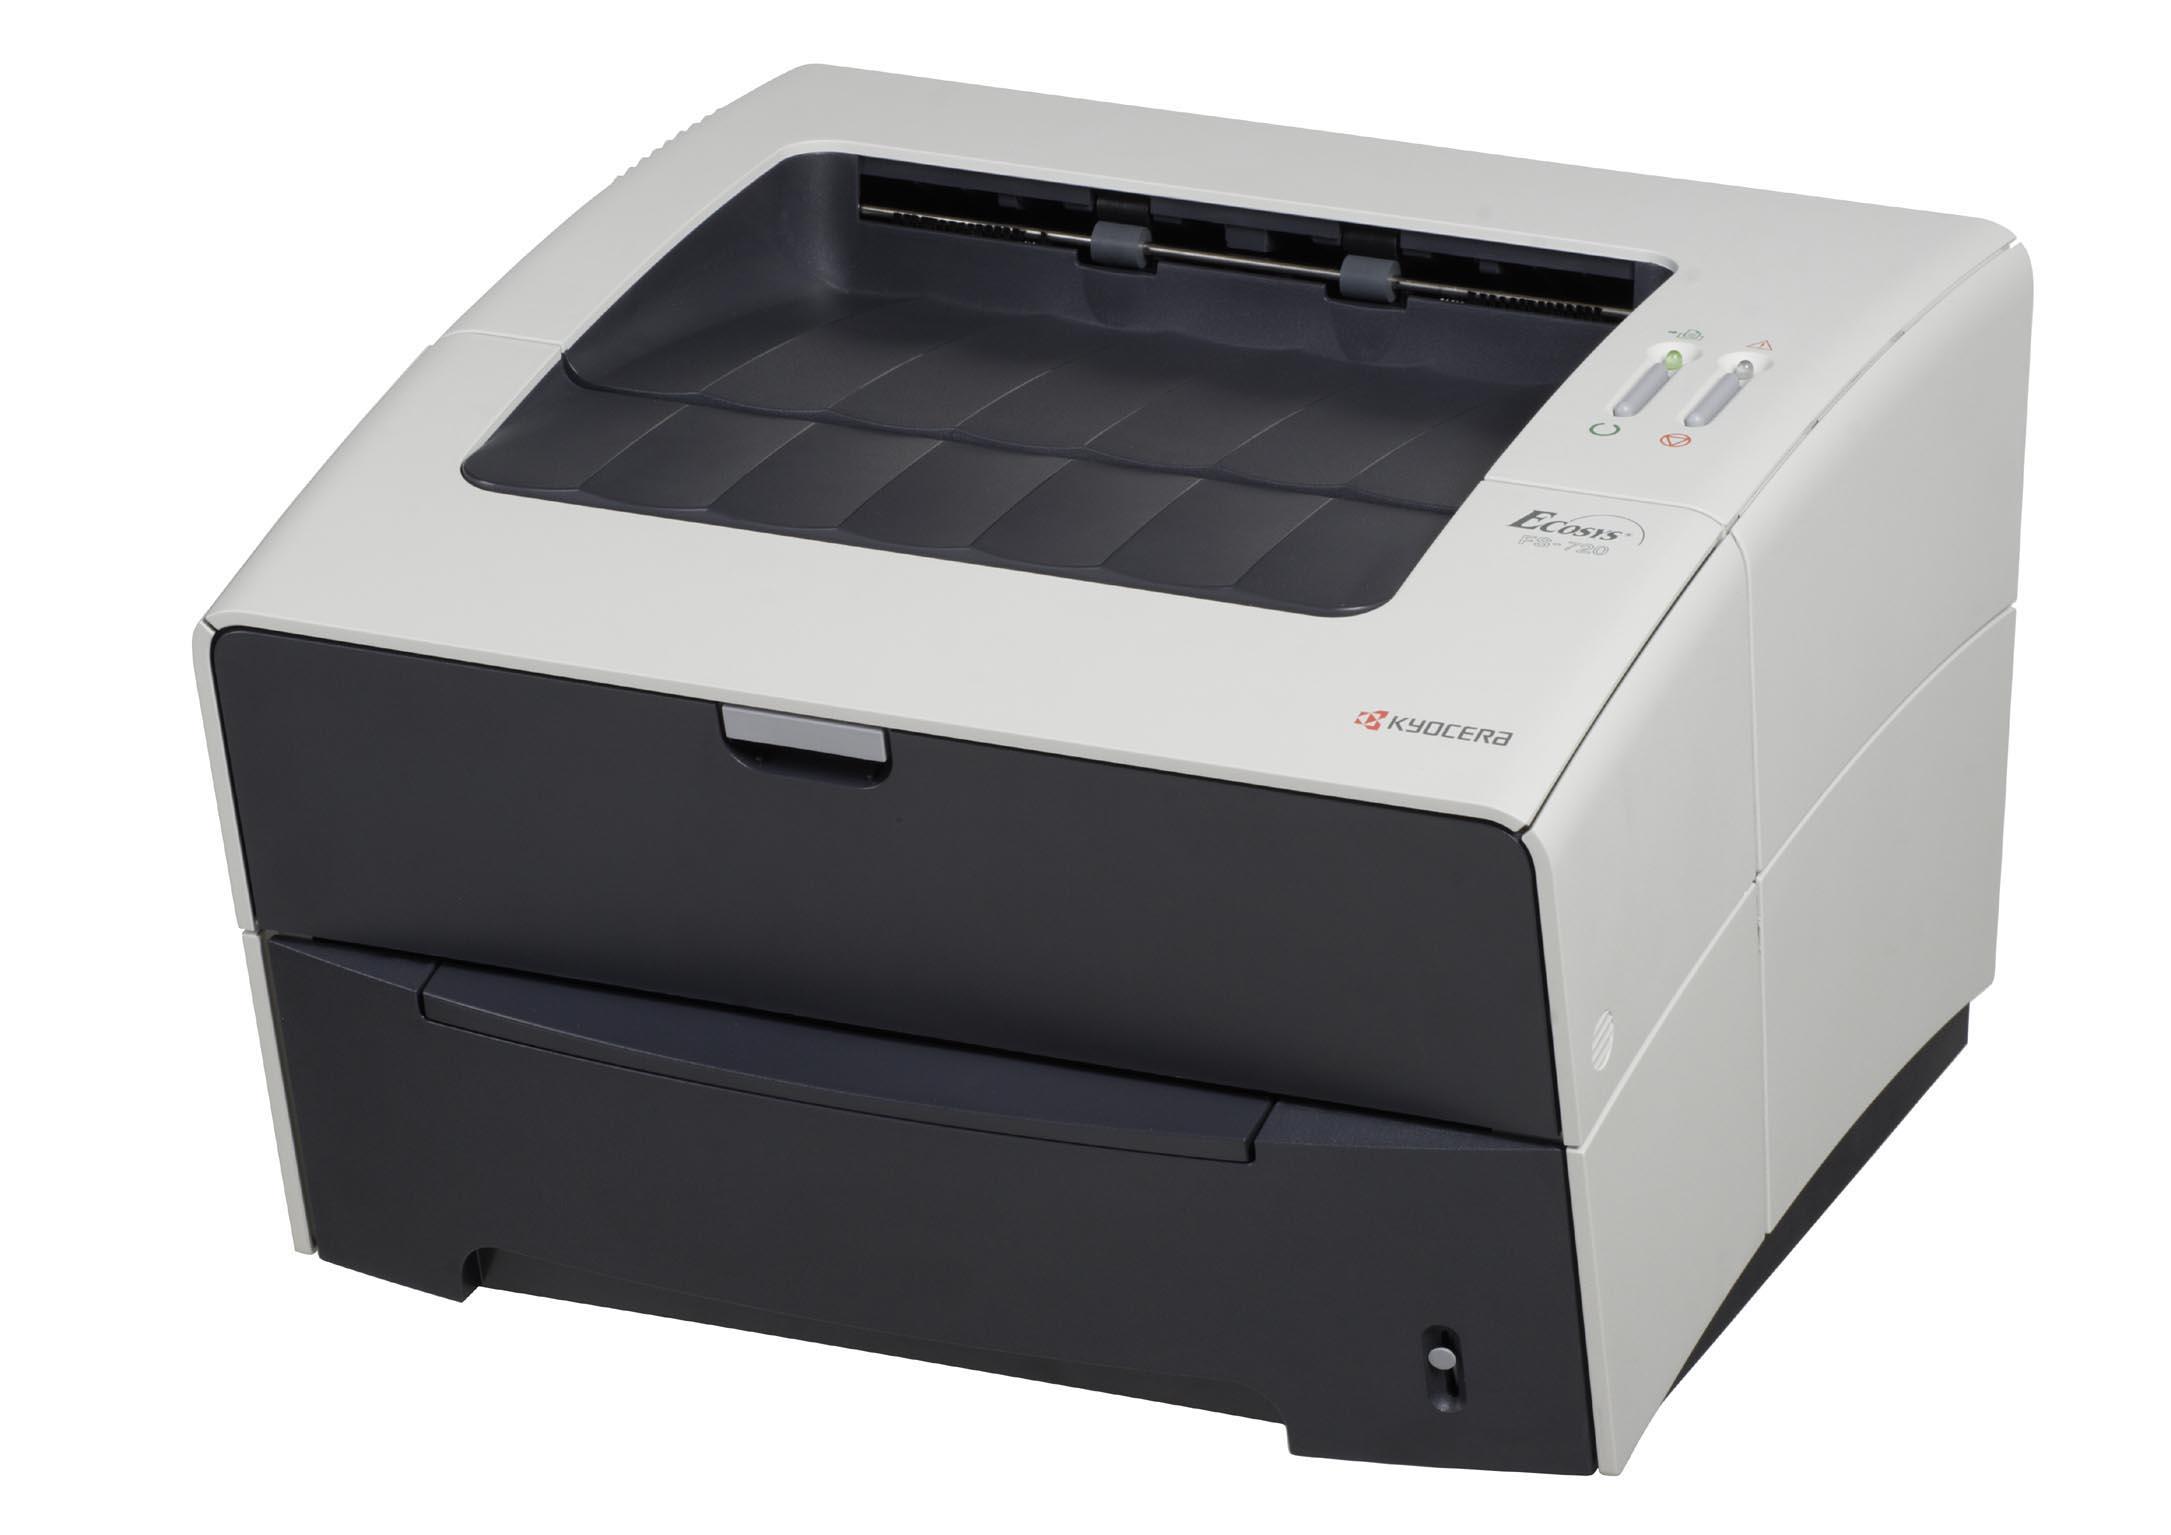 FS 720